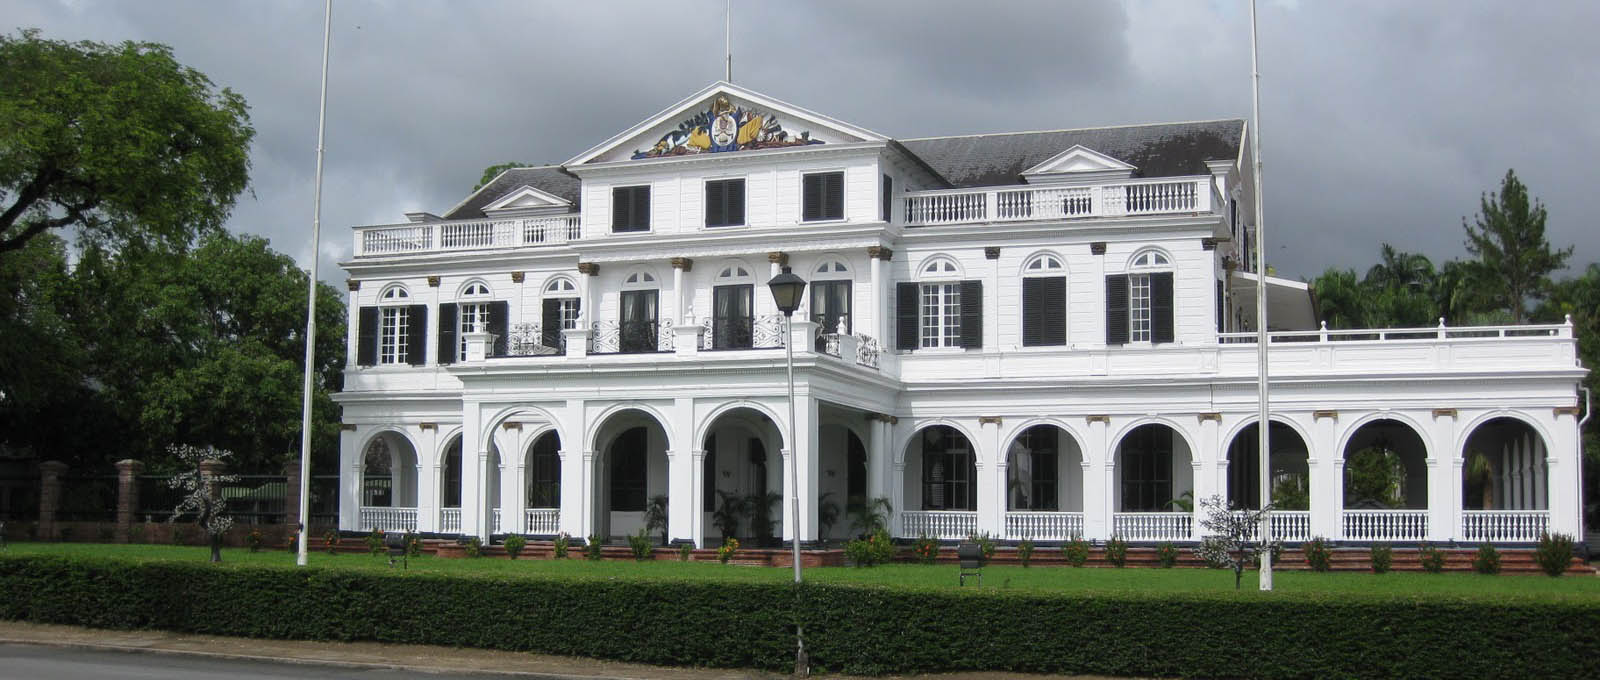 Dagblad Van Suriname Related Keywords - Dagblad Van Suriname Long Tail ...